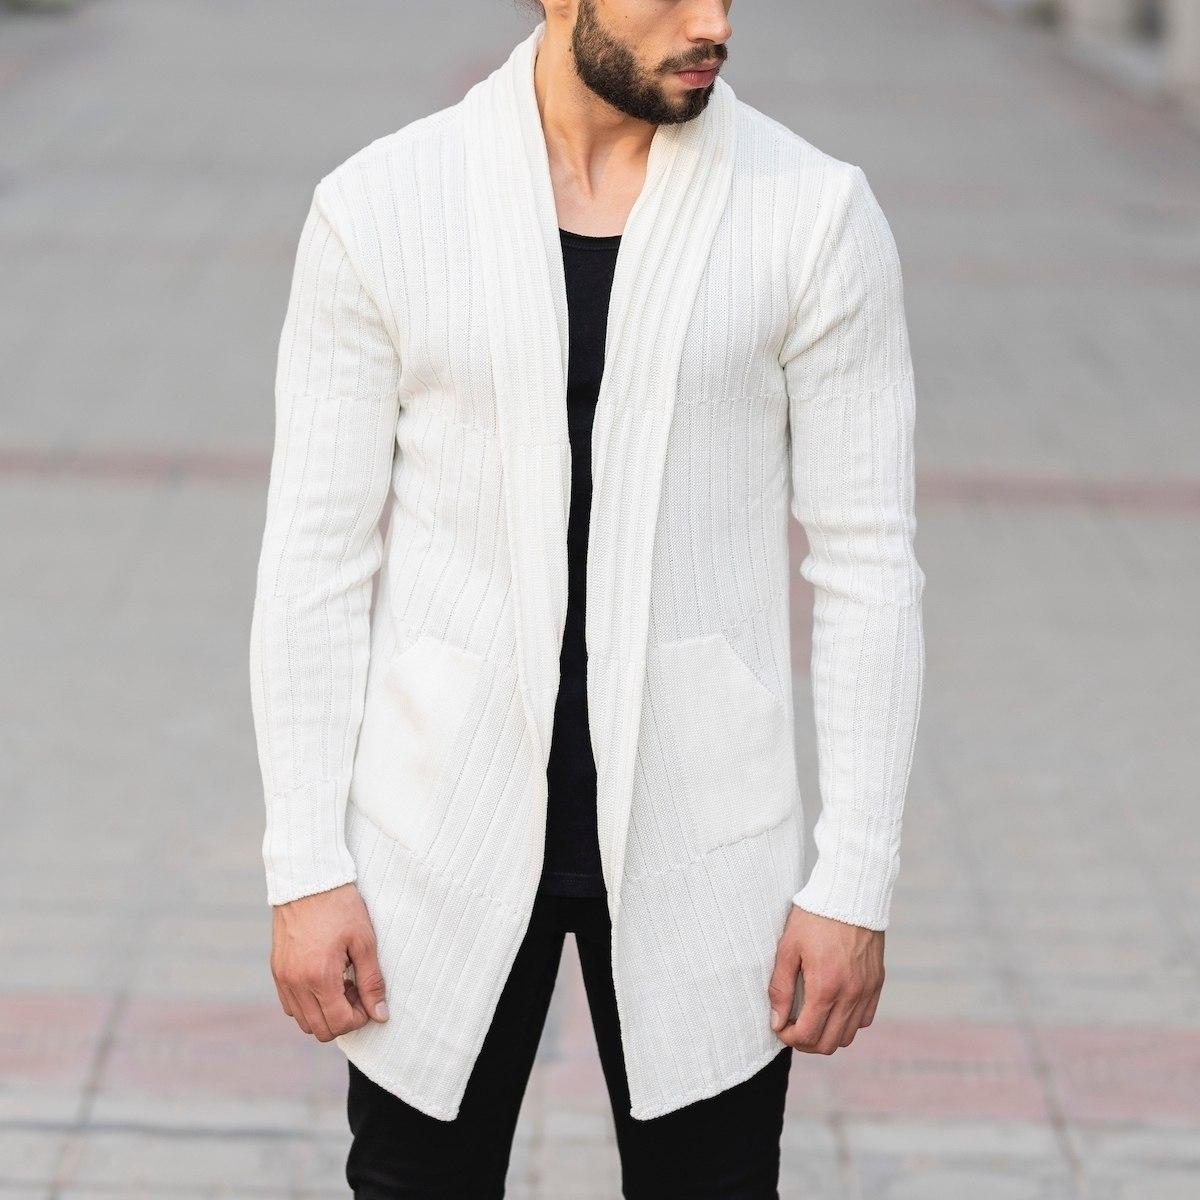 Striped Collar White Cardigan